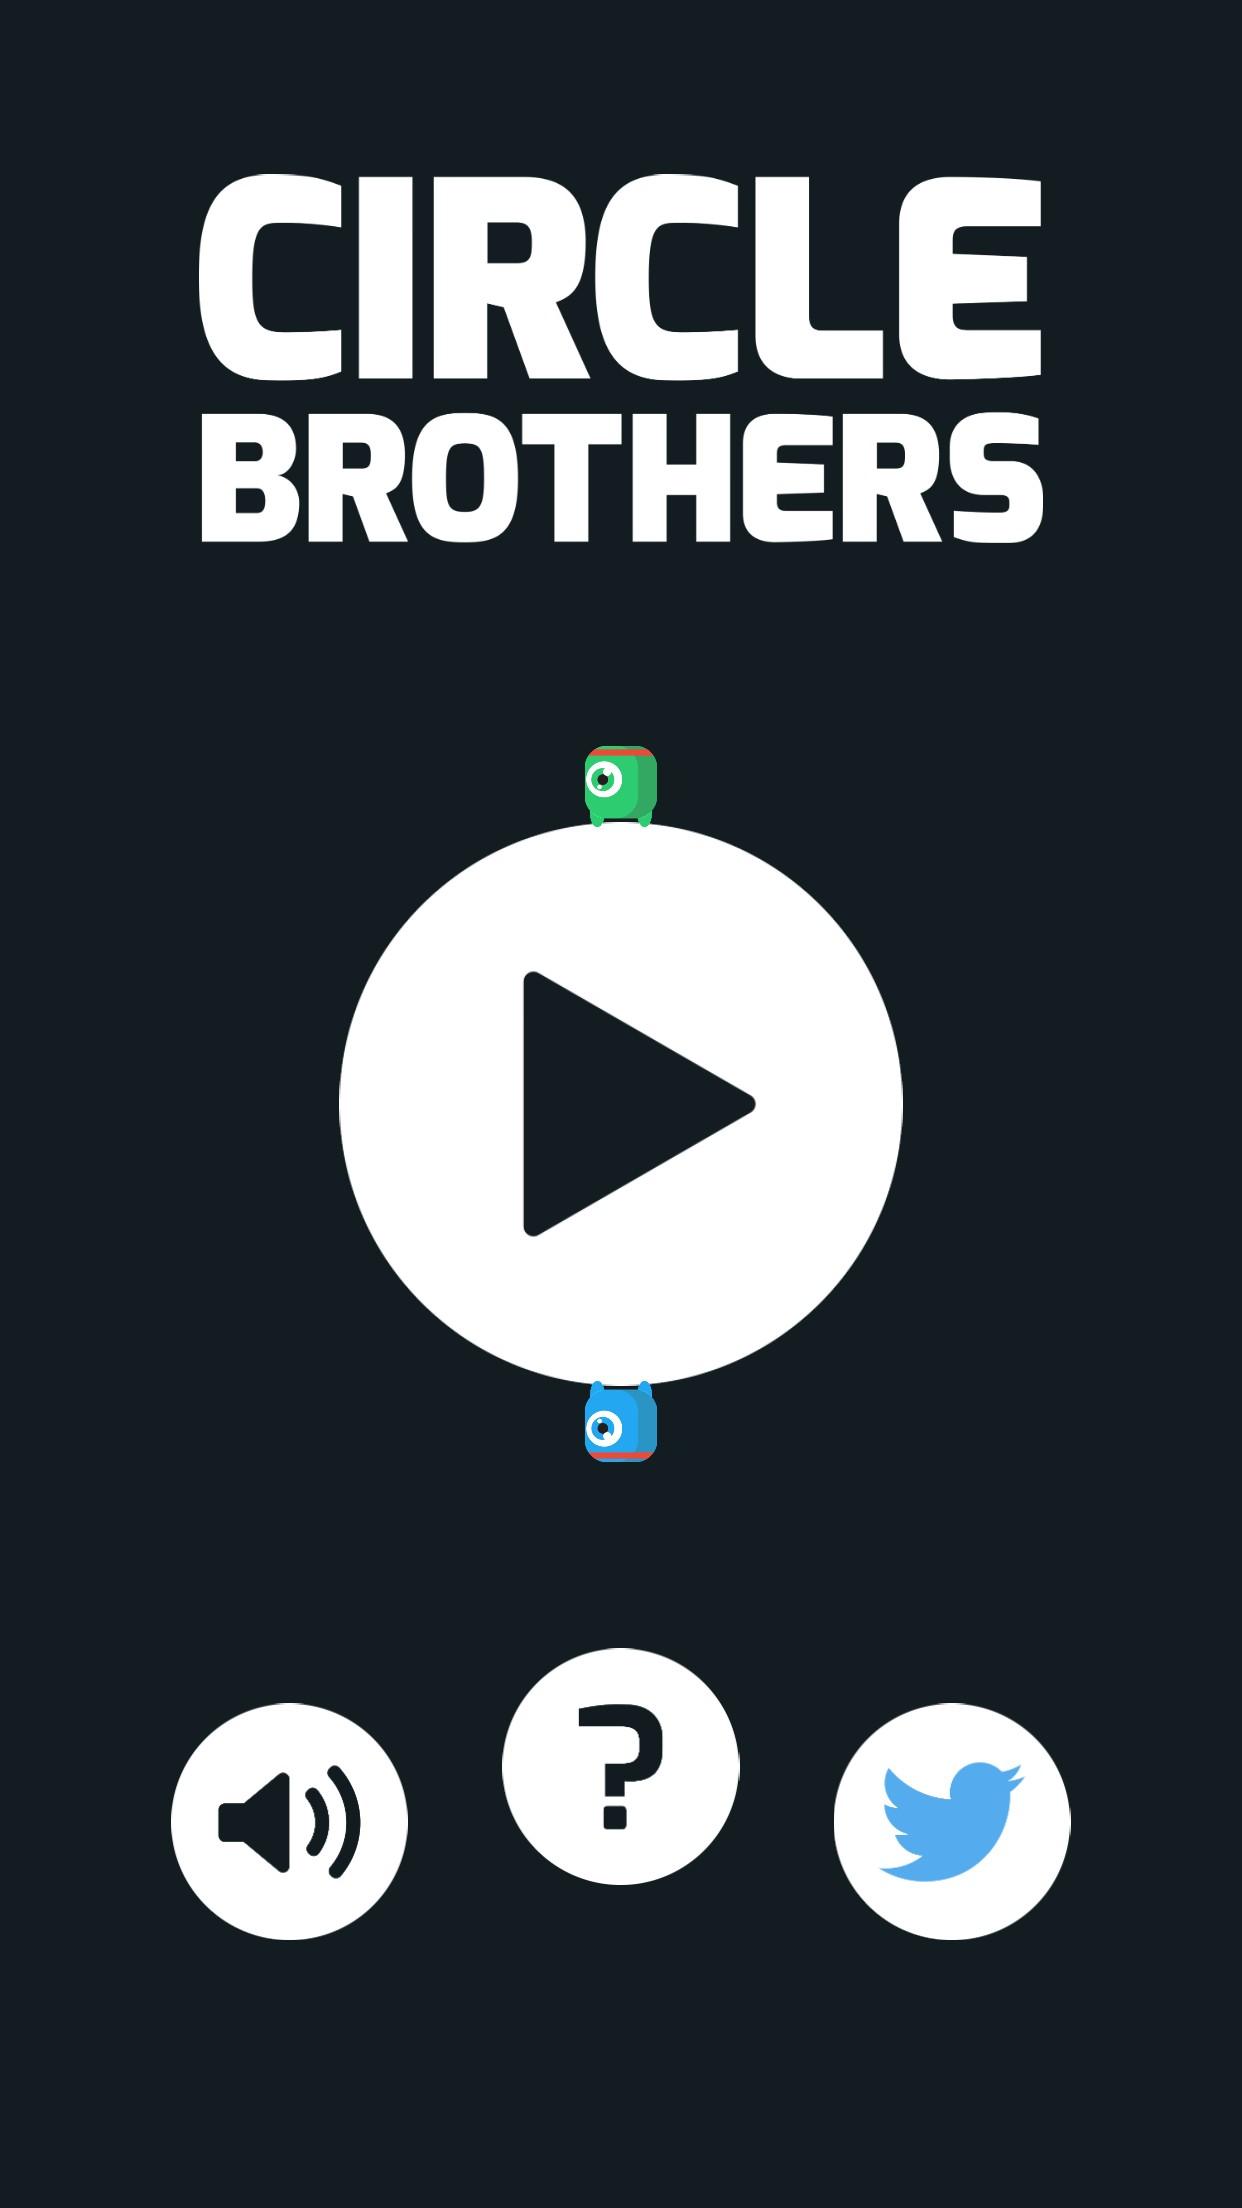 Image Circle Brothers